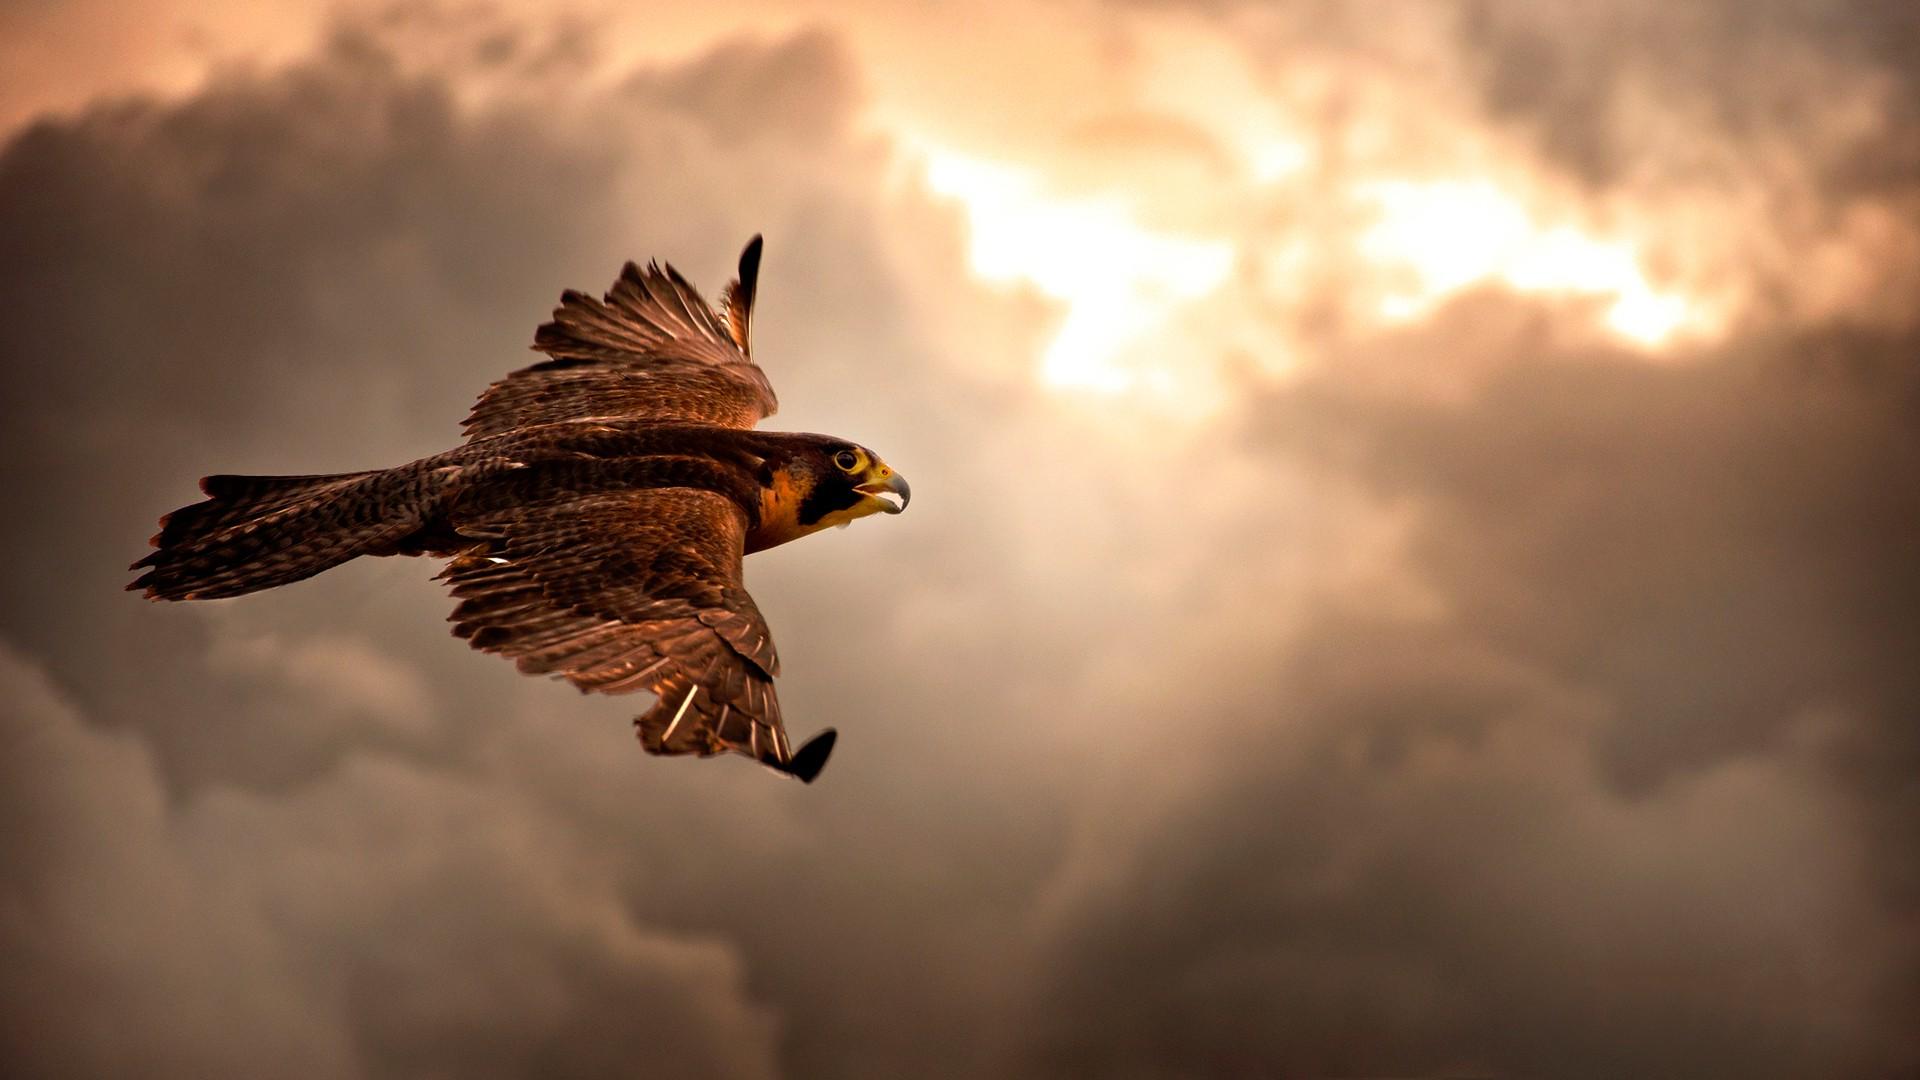 Sunlight Birds Animals Nature Sky Morning Hawks Bird Of Prey Eagle Flight Cloud Wing 1920x1080